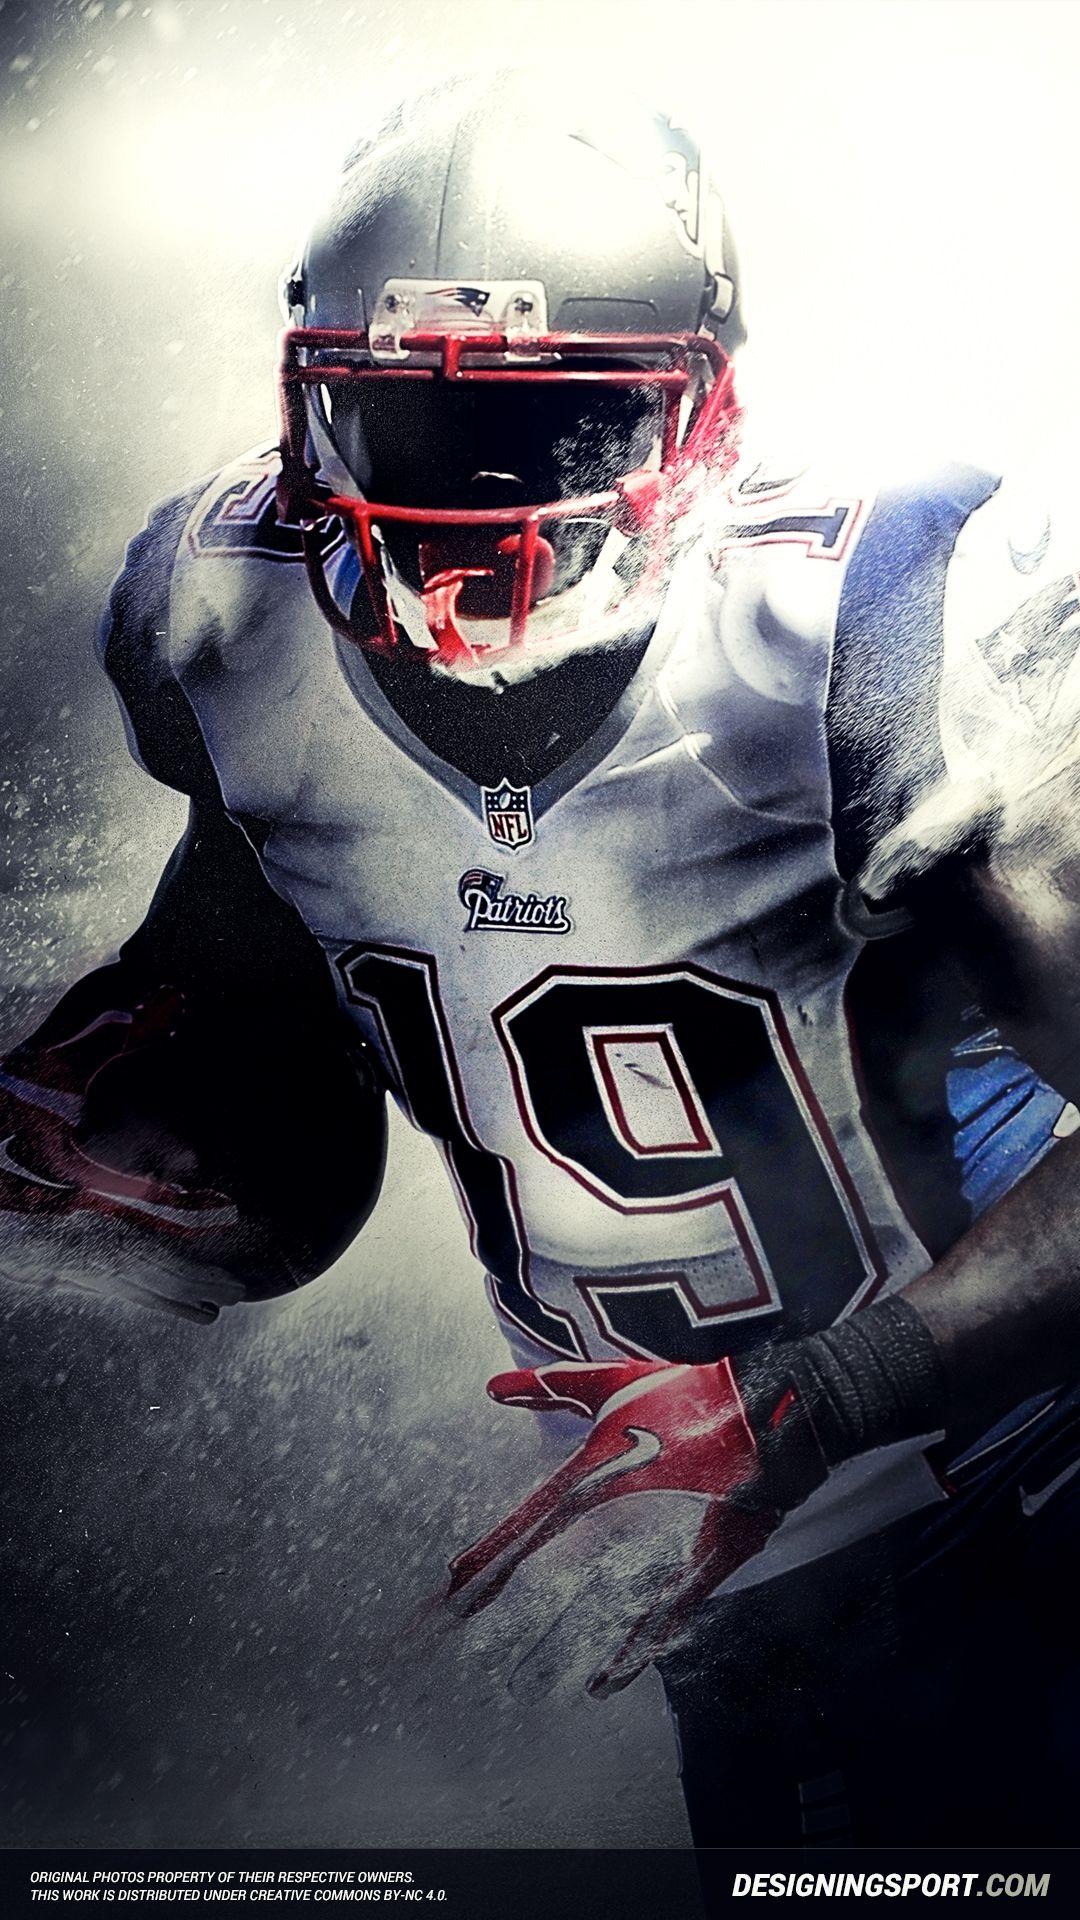 Designingsport New England Patriots Patriots New England Patriots Schedule